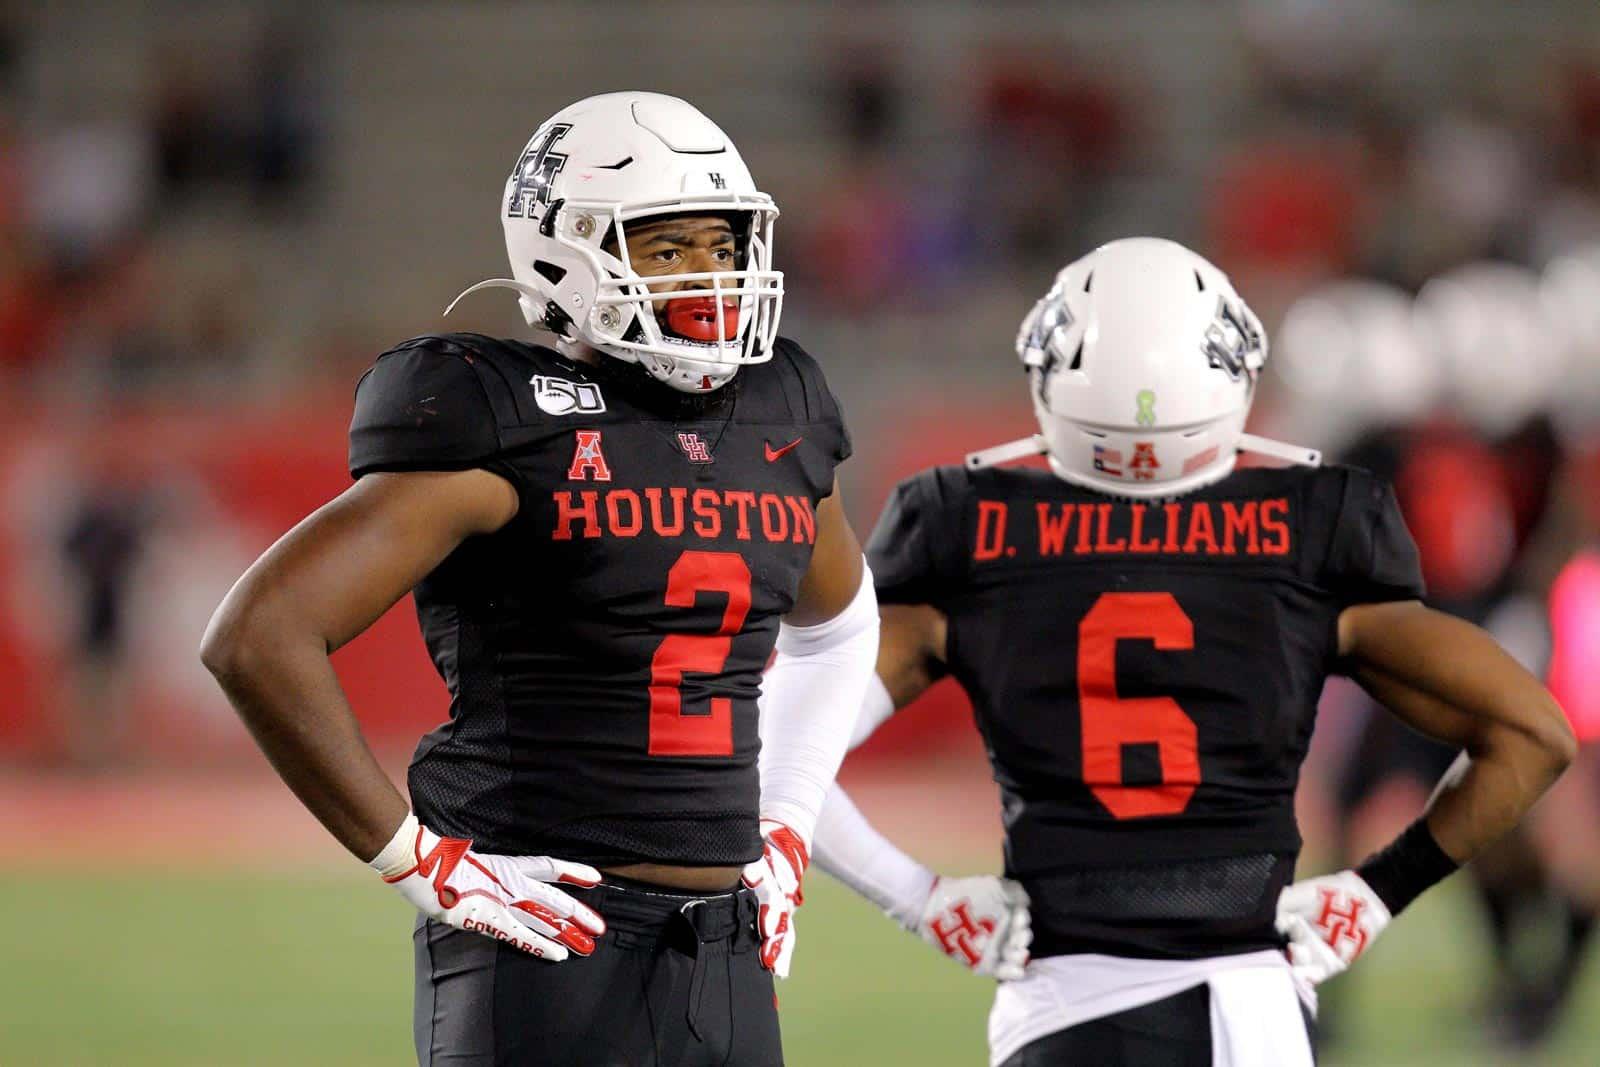 Houston Cougars